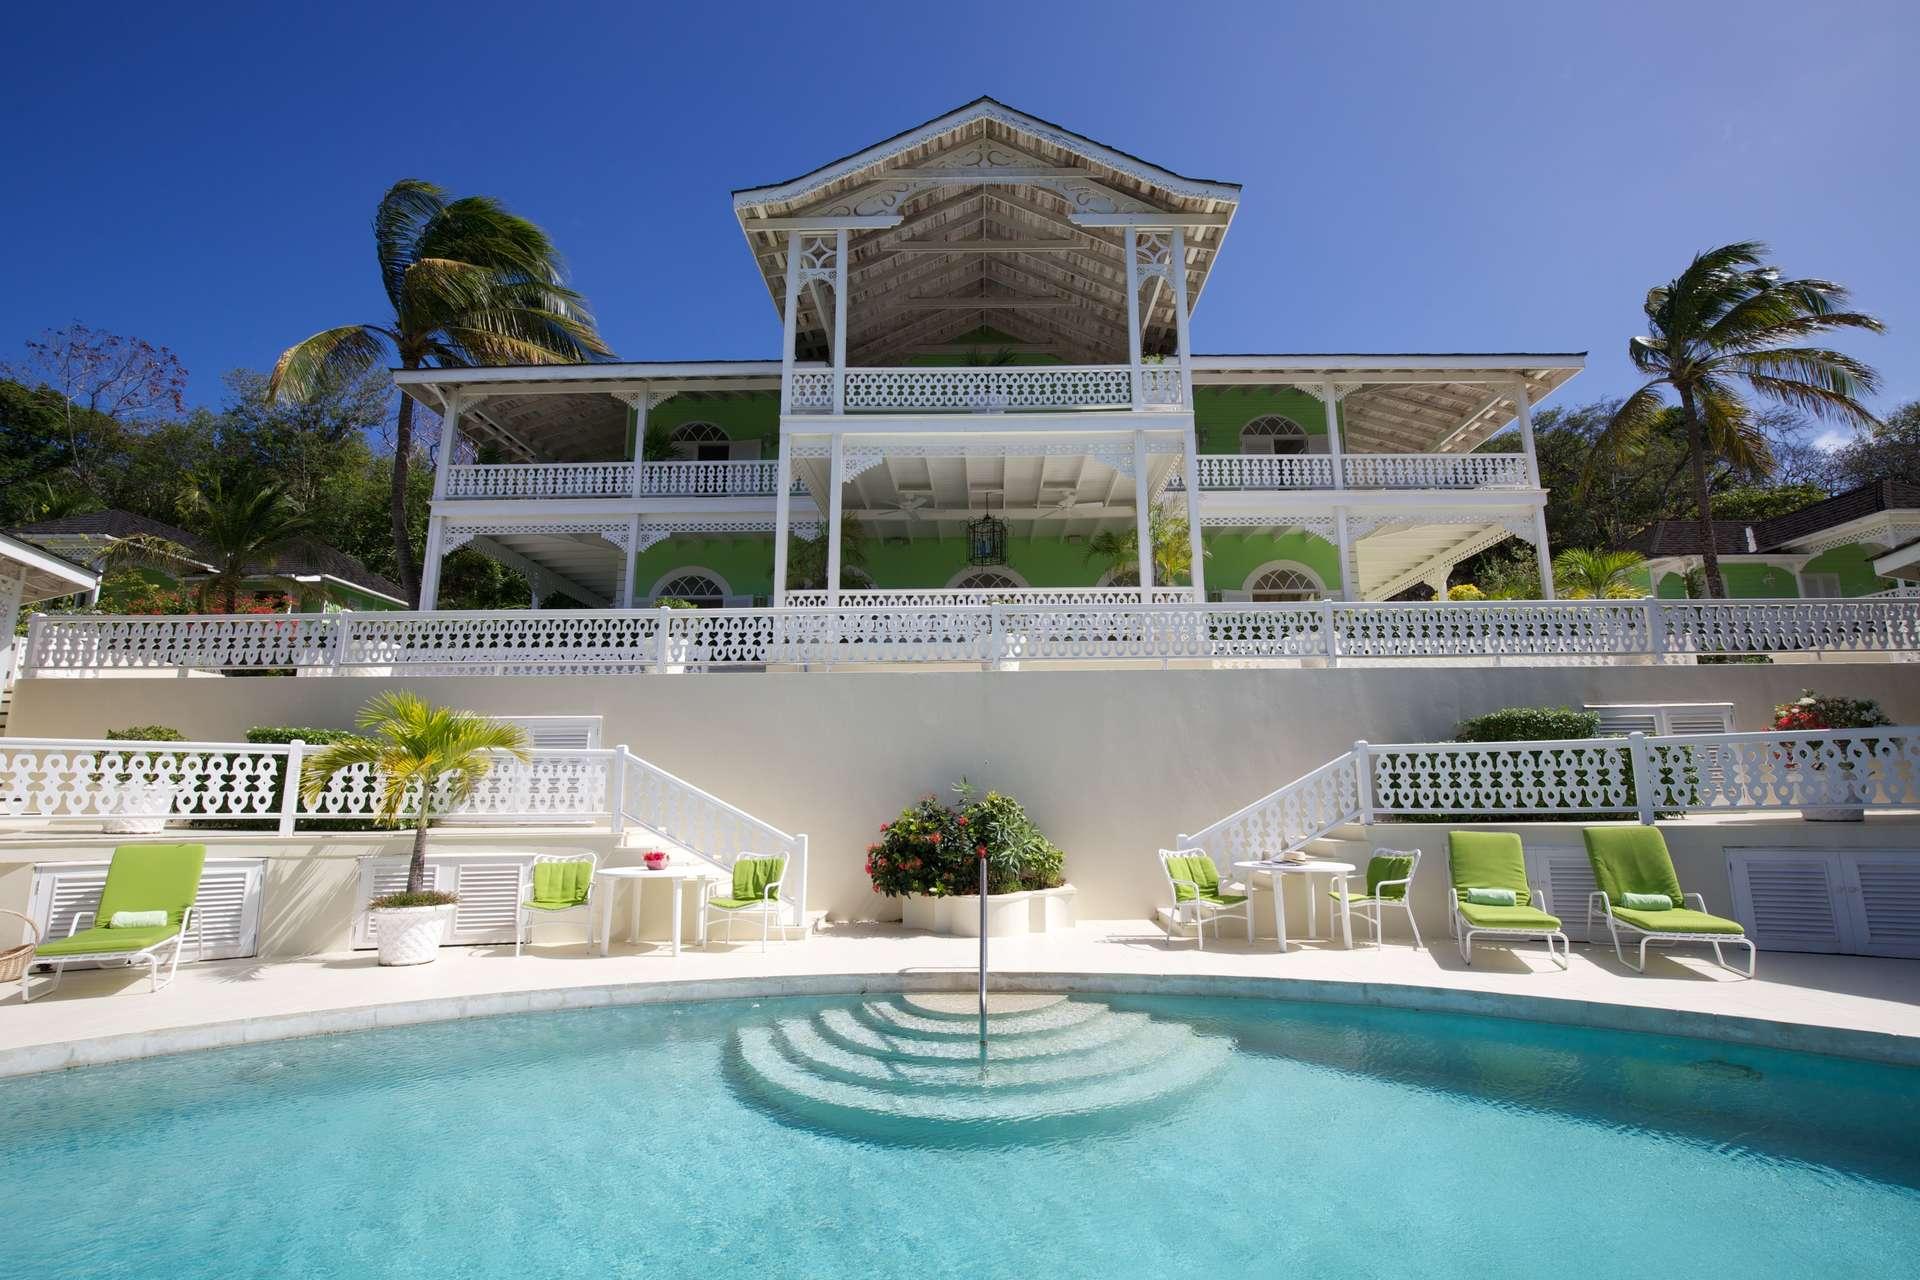 Luxury villa rentals caribbean - St vincent and the grenadines - St vincent - Mustique - Zinnia - Image 1/11